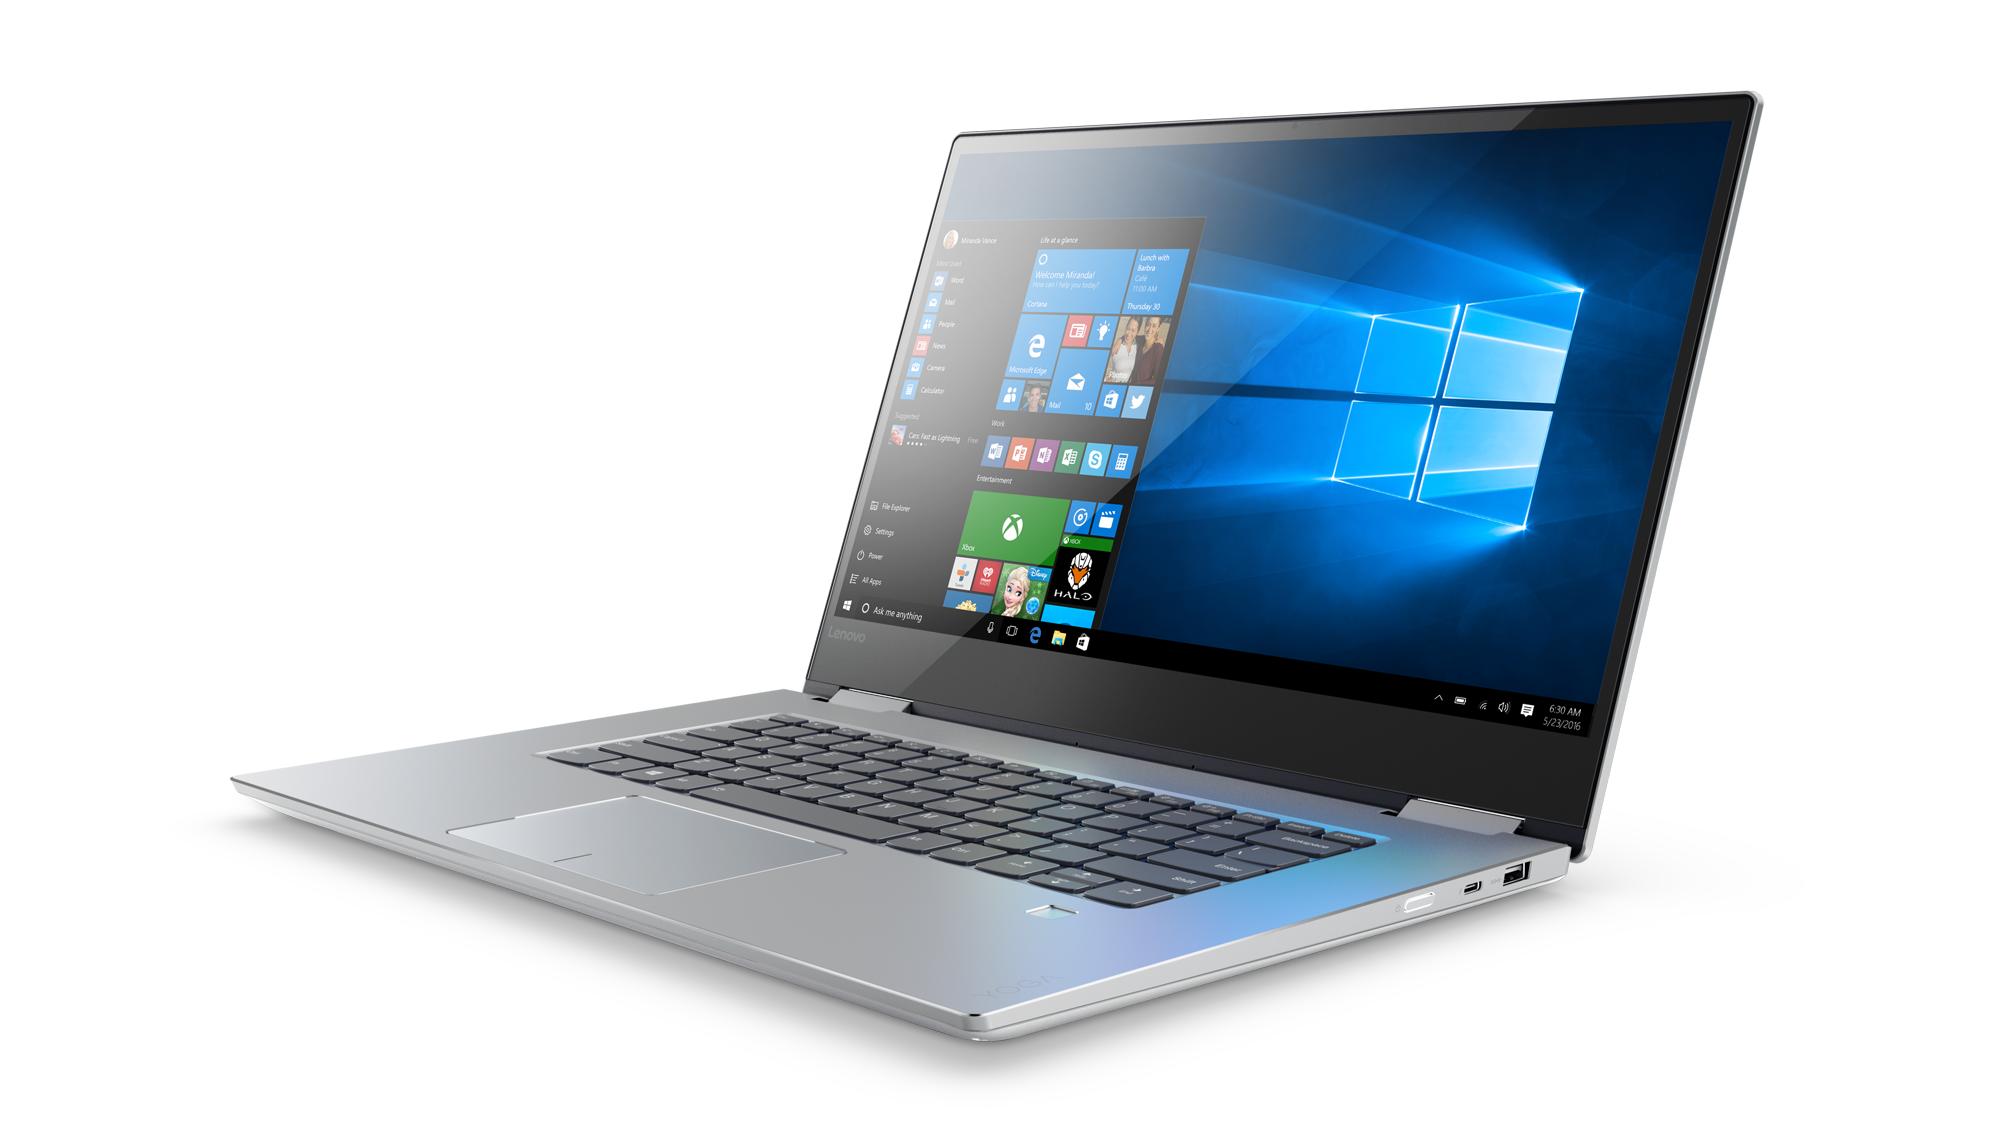 Lenovo IdeaPad YOGA 720-15IKB 720 15.6 FHD IPS AG T/i7-7700HQ/8G/512G/NV4G/W10H/Backlit/Platinum